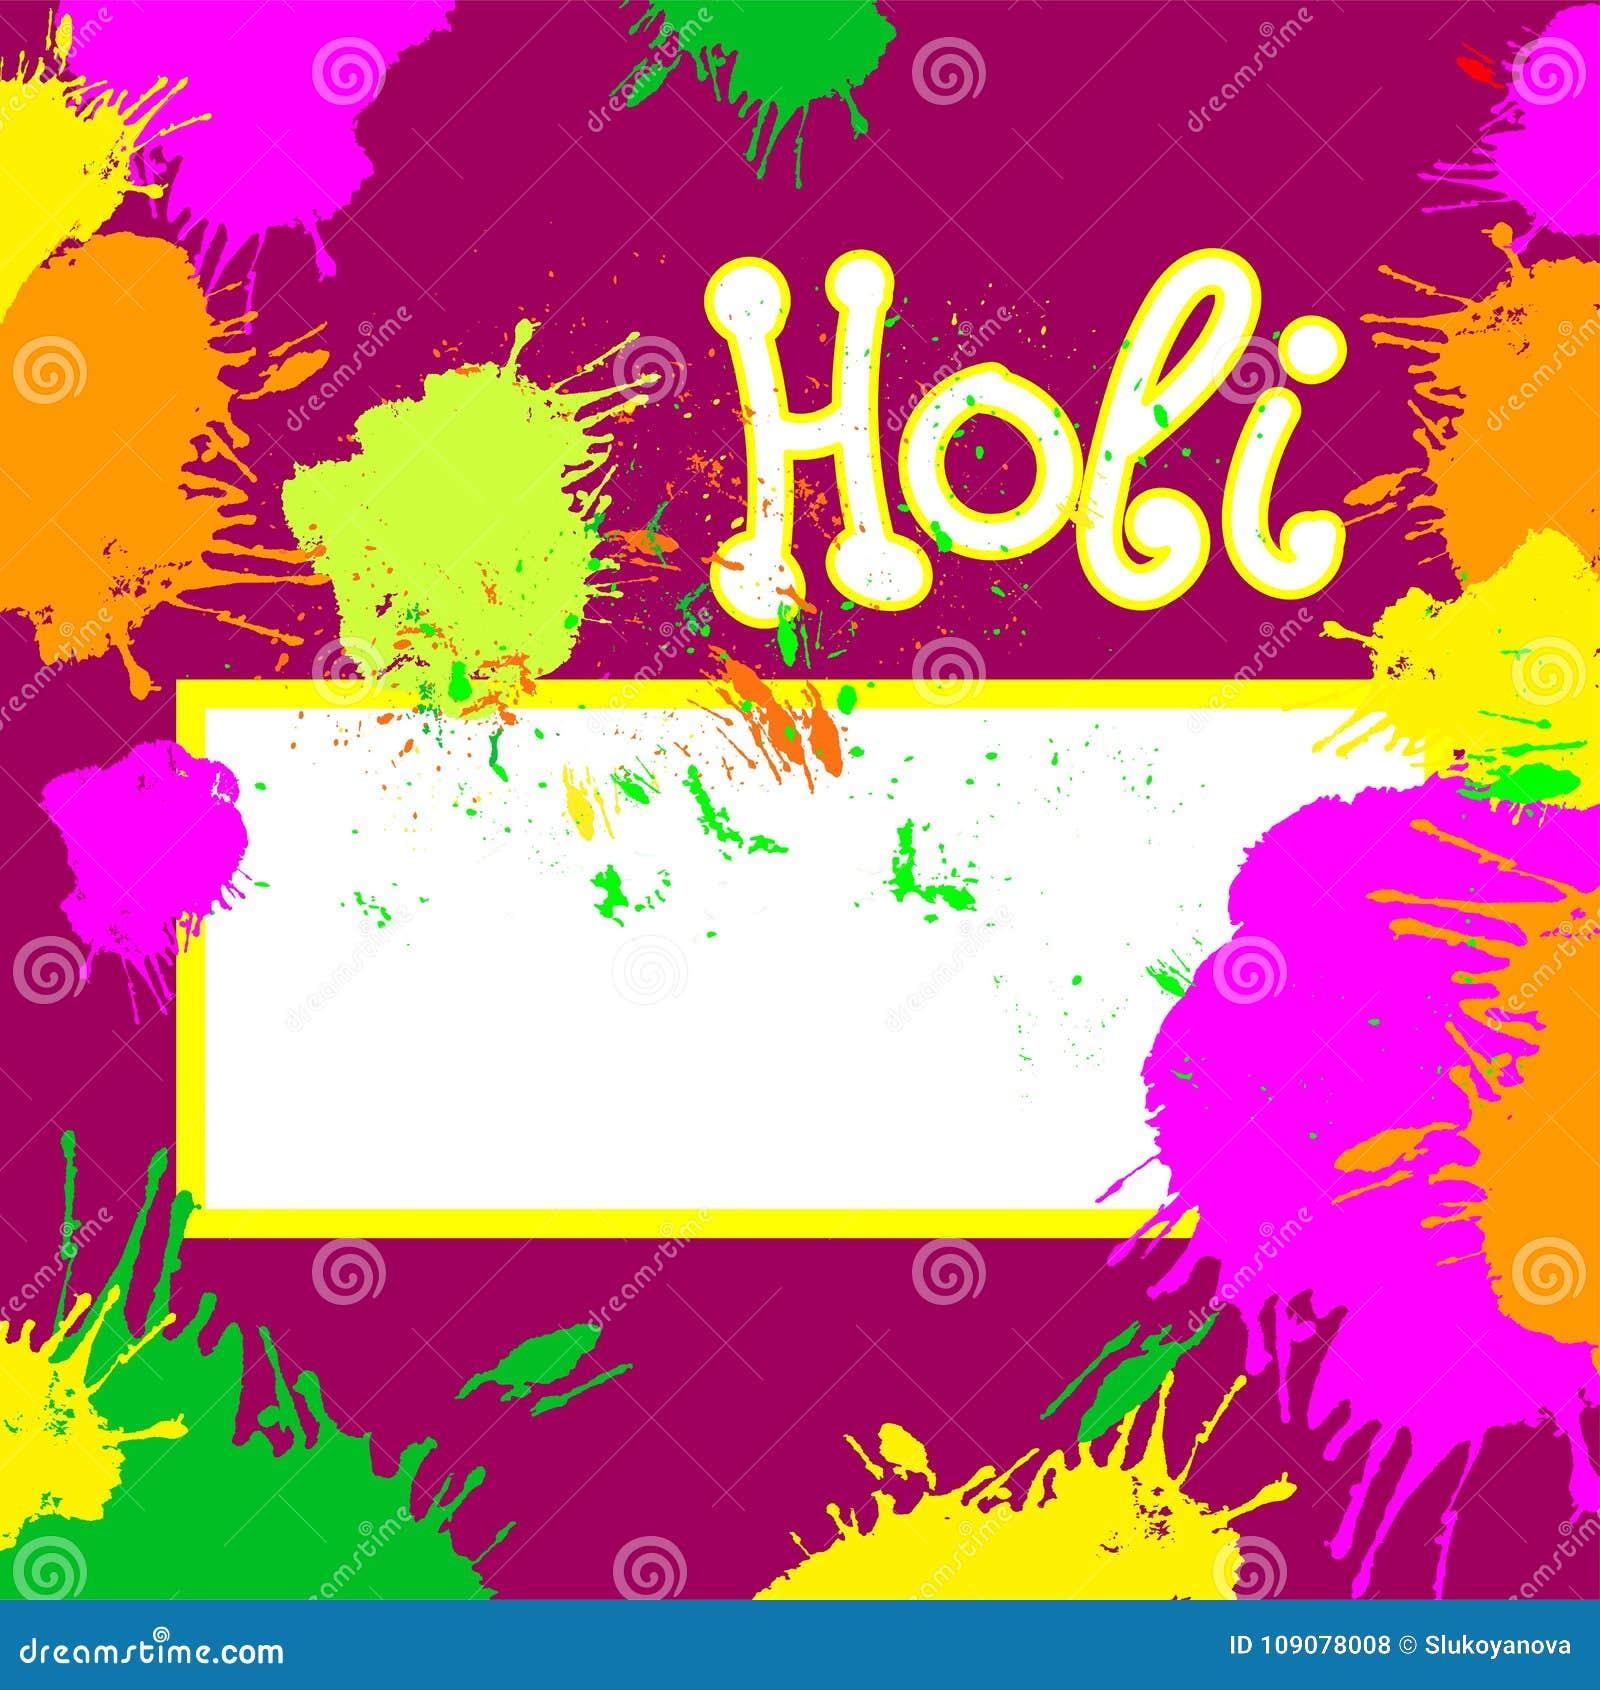 Holi Letter Text stock vector. Illustration of paint - 109078008